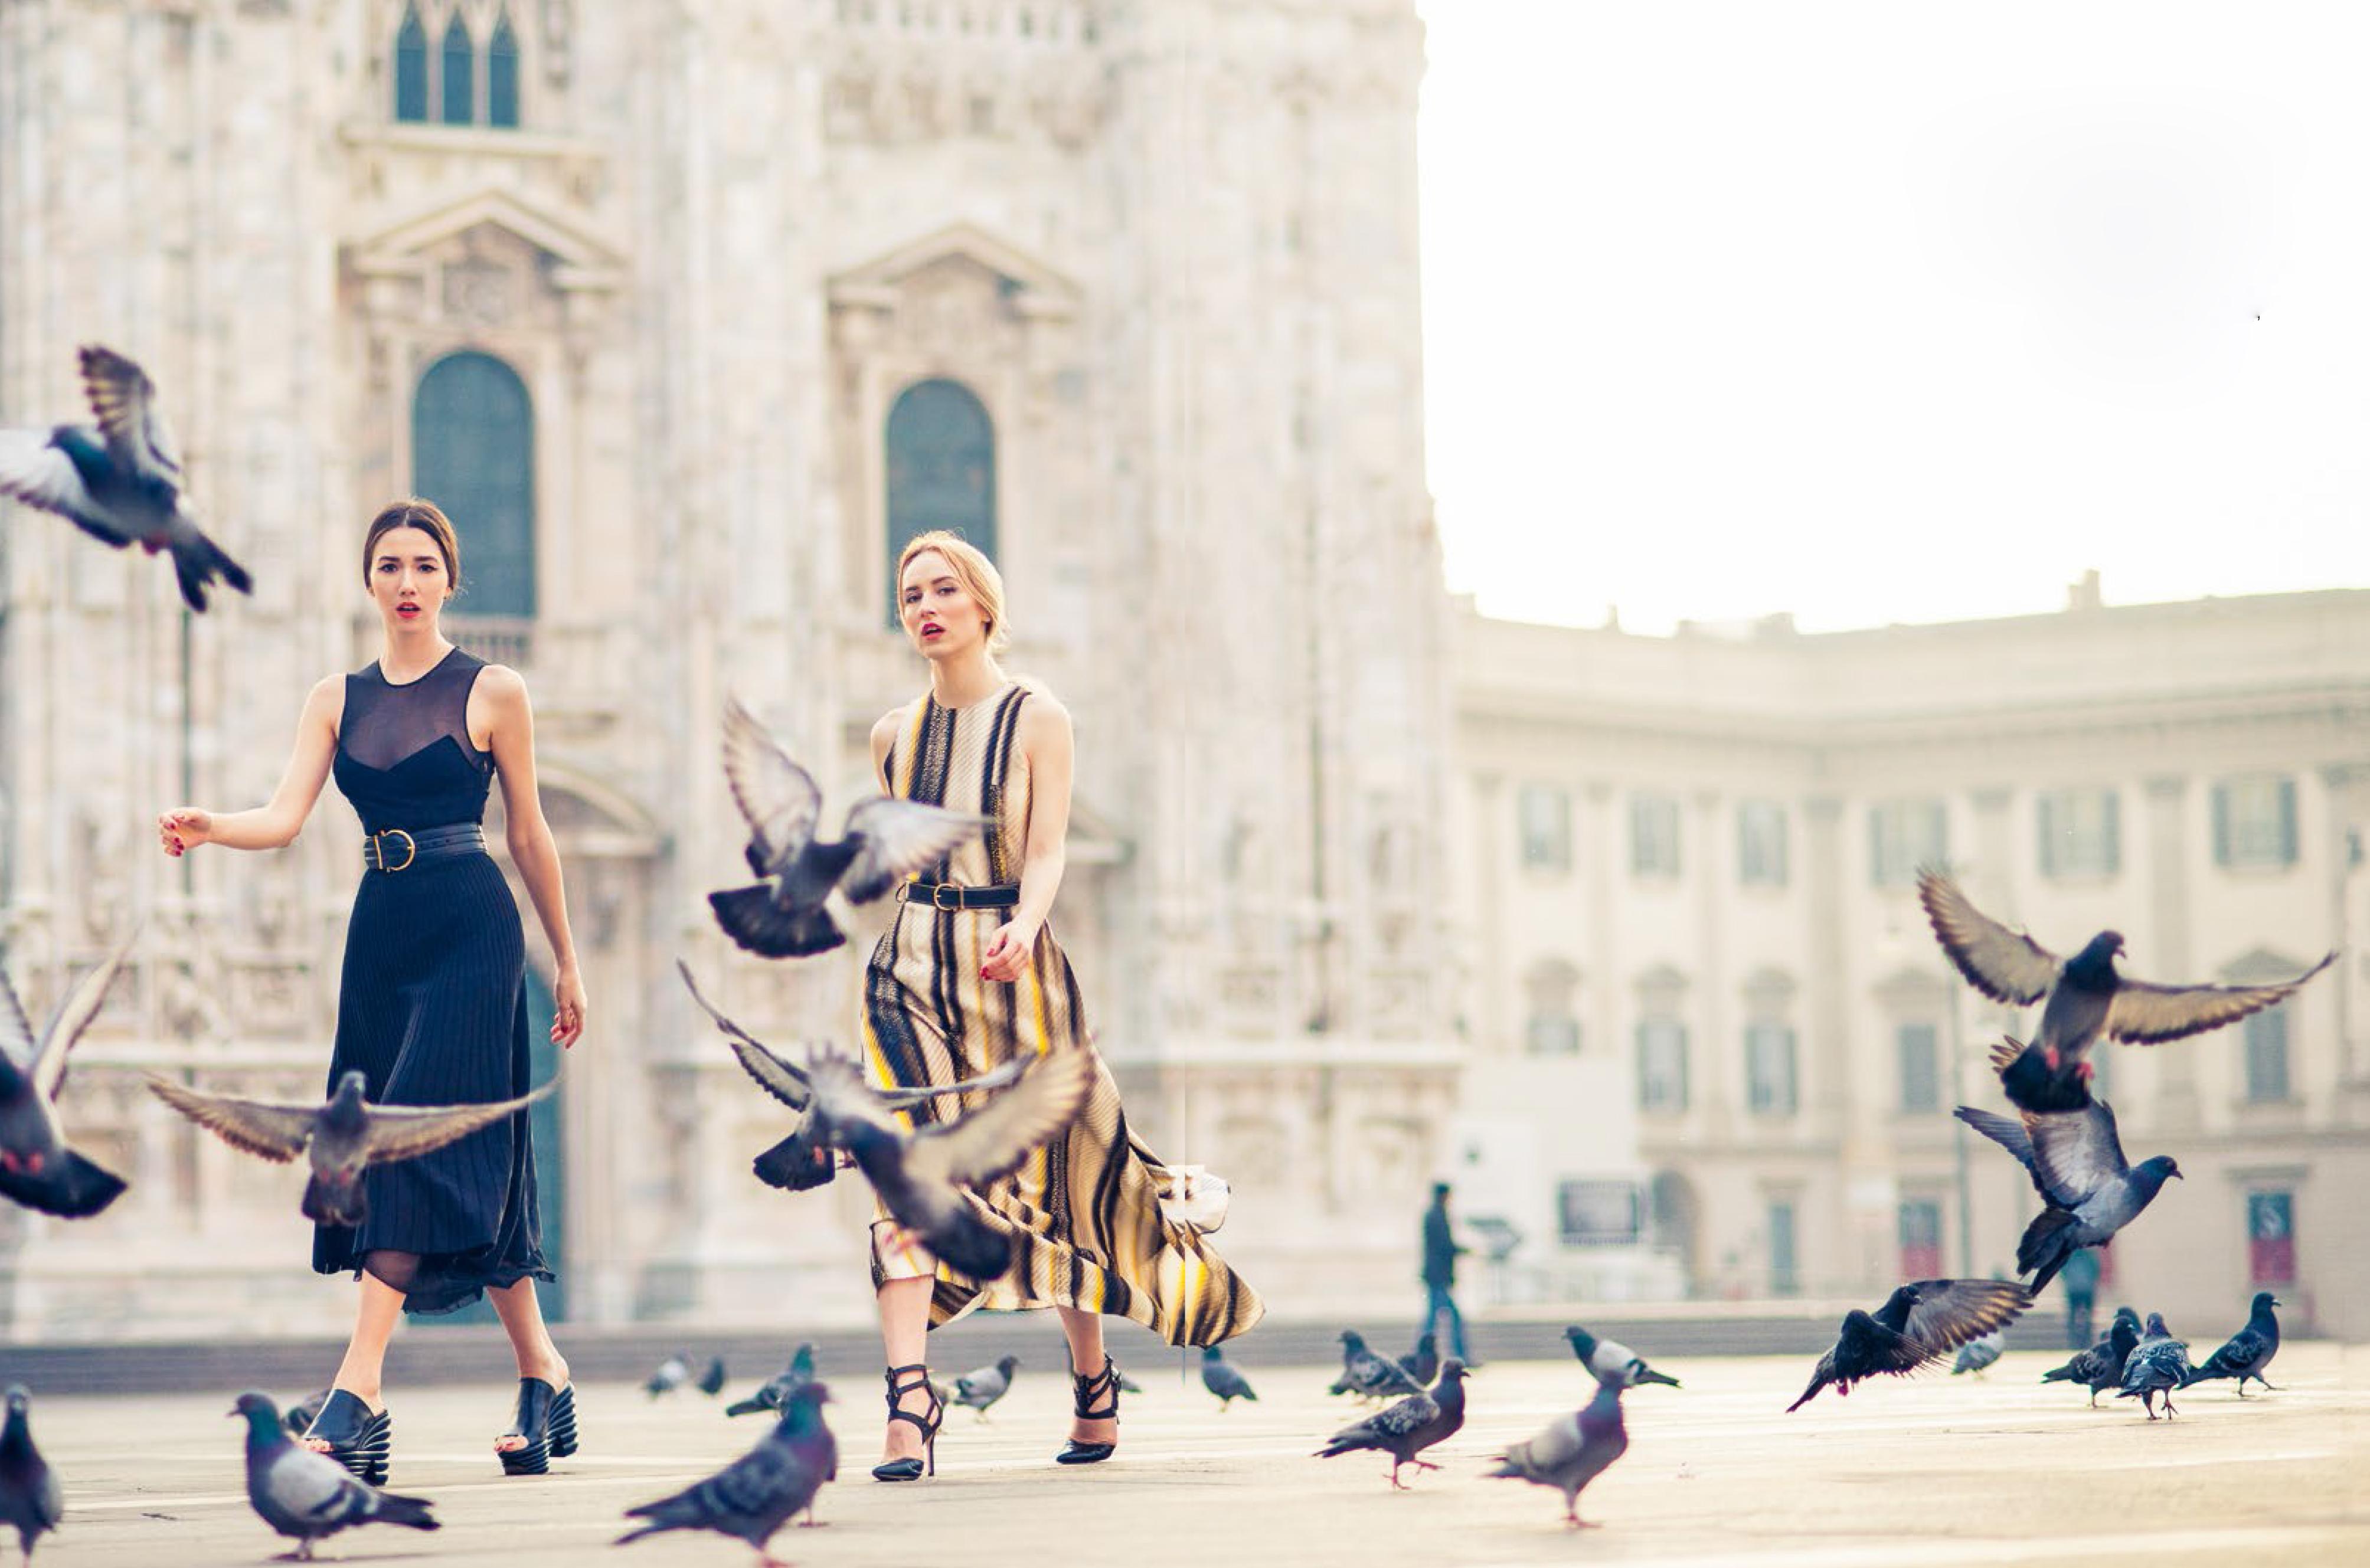 glamour magazine_milan editorial_milan fashion week_fabulous muses_alina tanasa_diana enciu_ferragamo2014 (2)